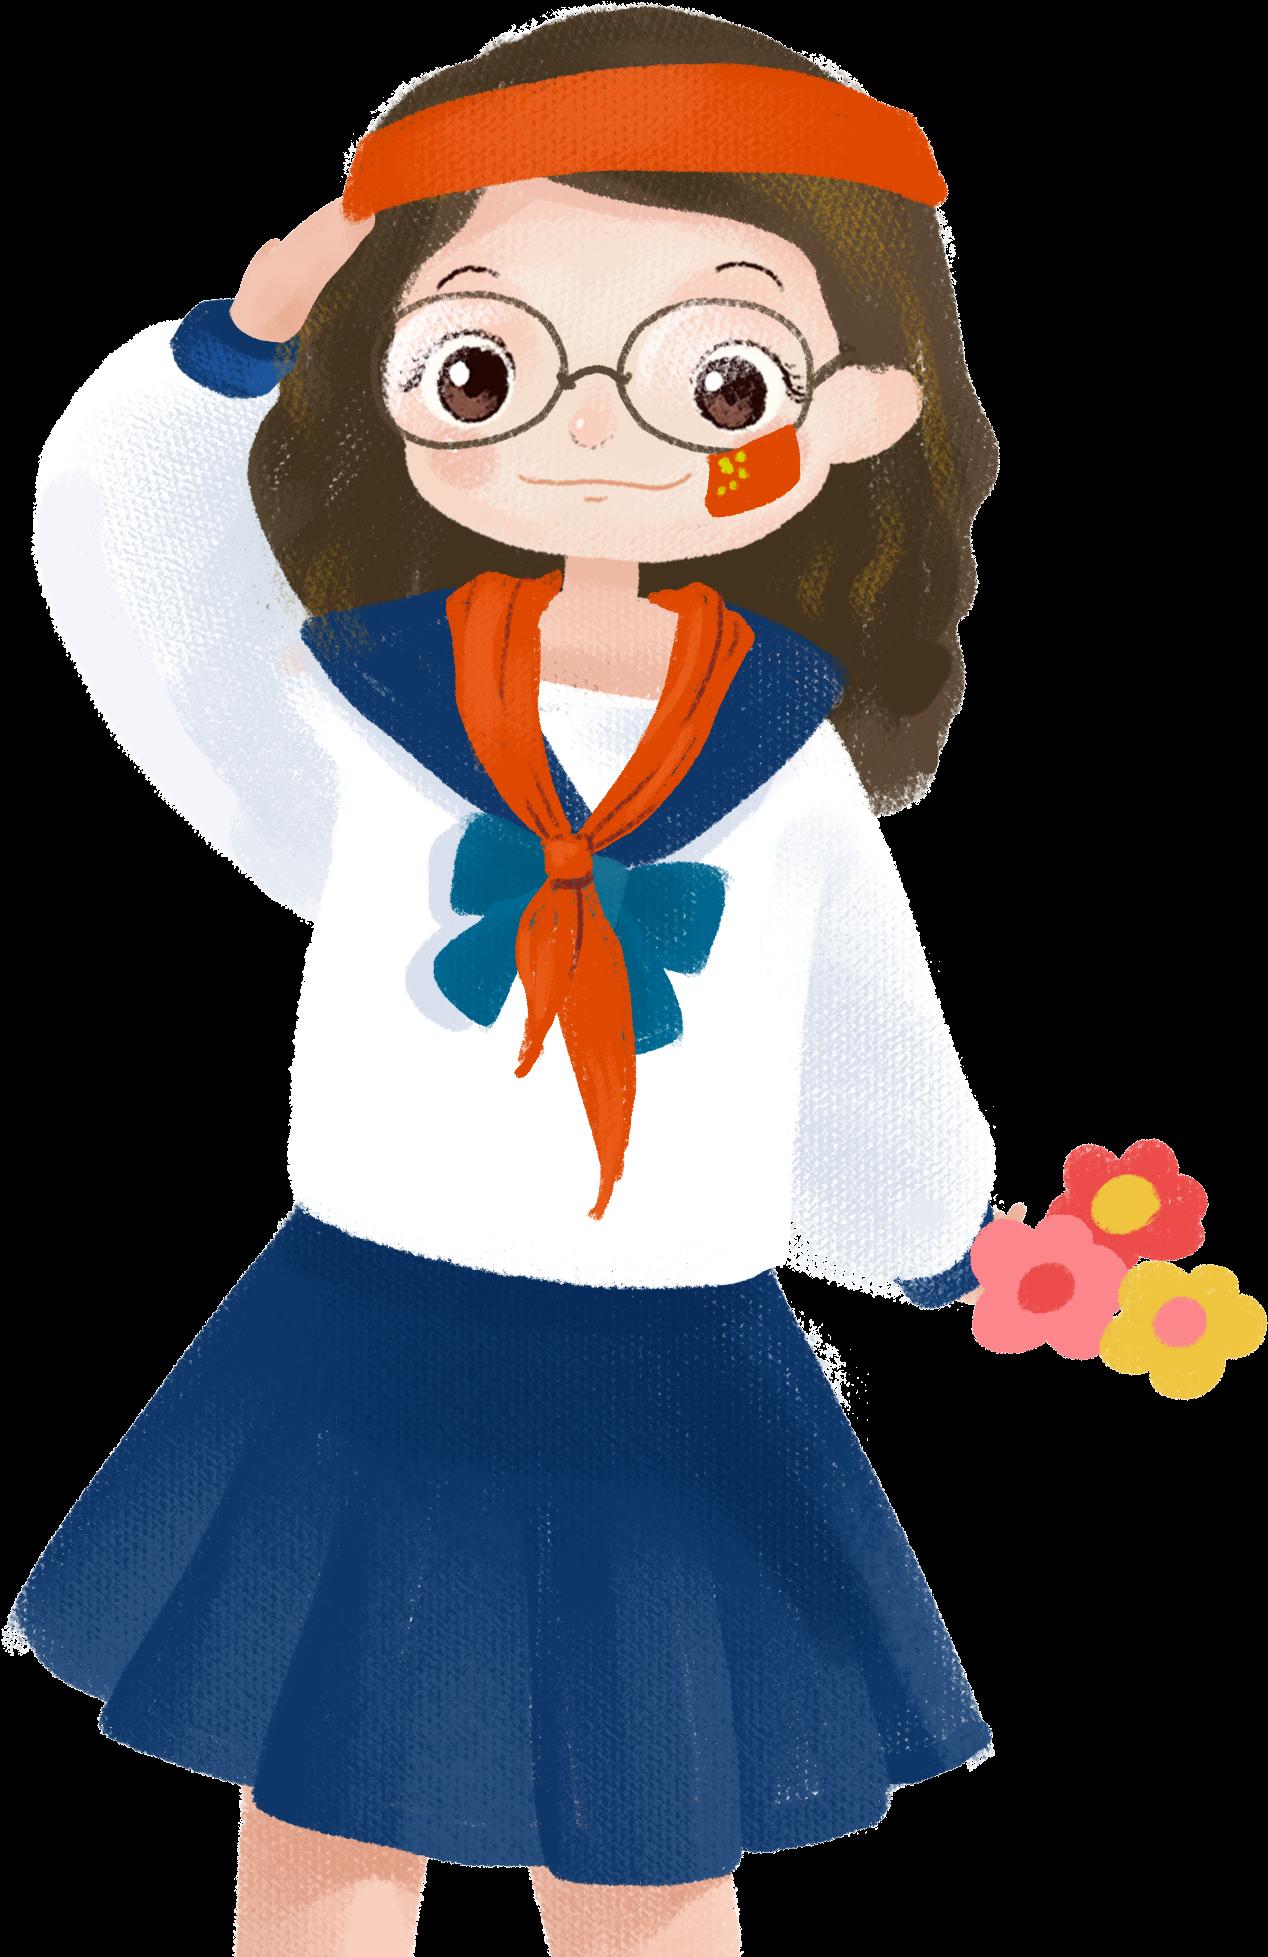 Cartoon Cute Girl Character Png And Psd - ภาพ การ์ตูน เด็ก ...